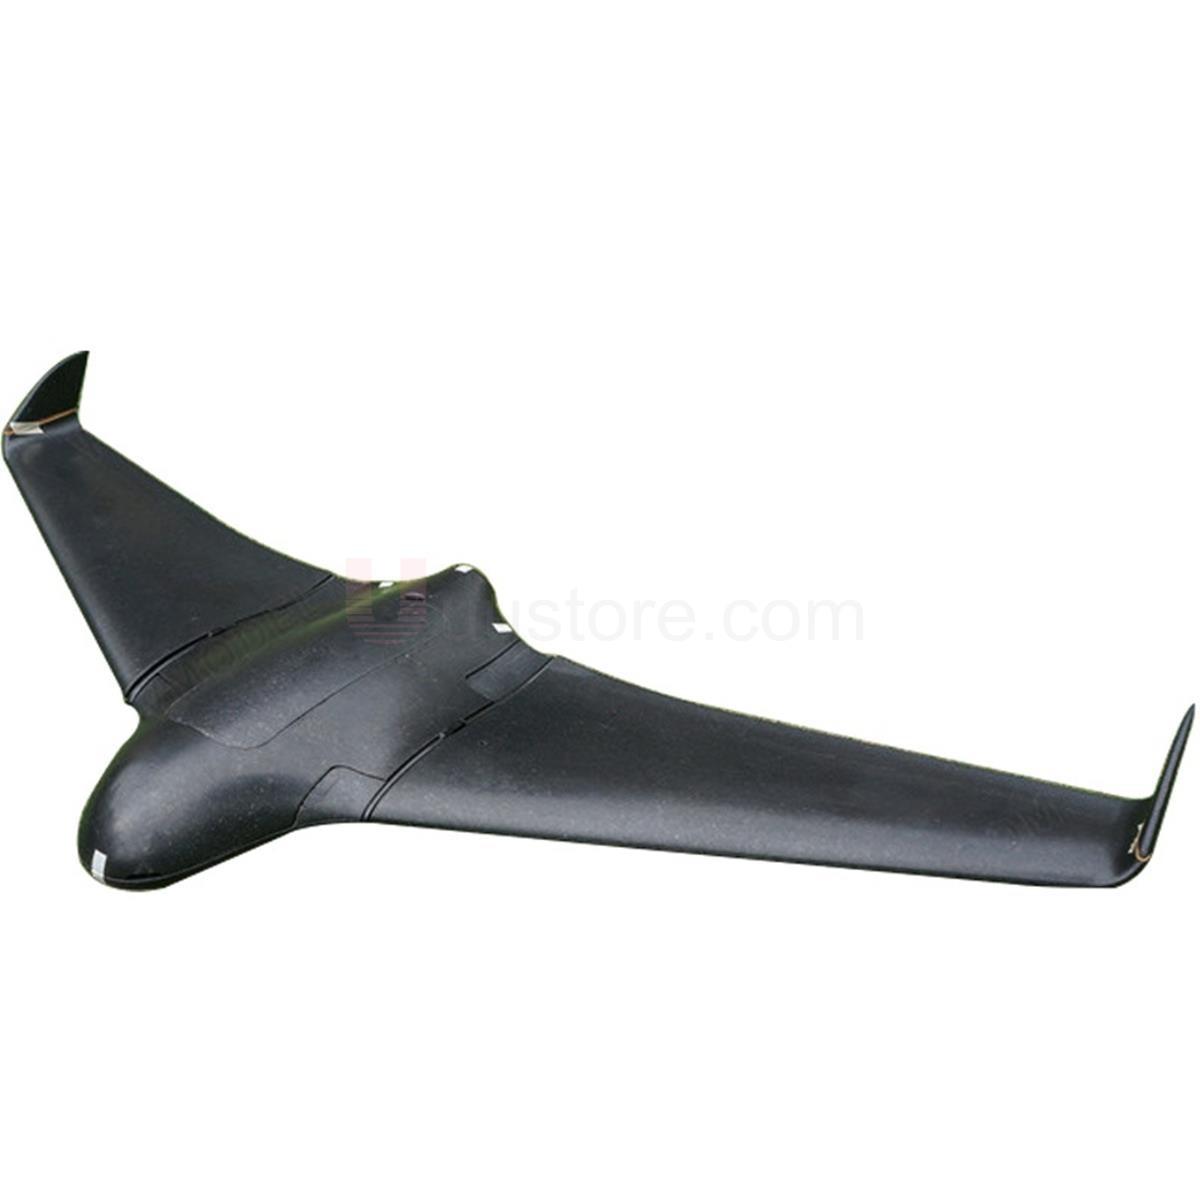 Skywalker X8 2120mm EPO UAV Flying Wing FPV RC Plane KIT (Black) Remote Control Toy